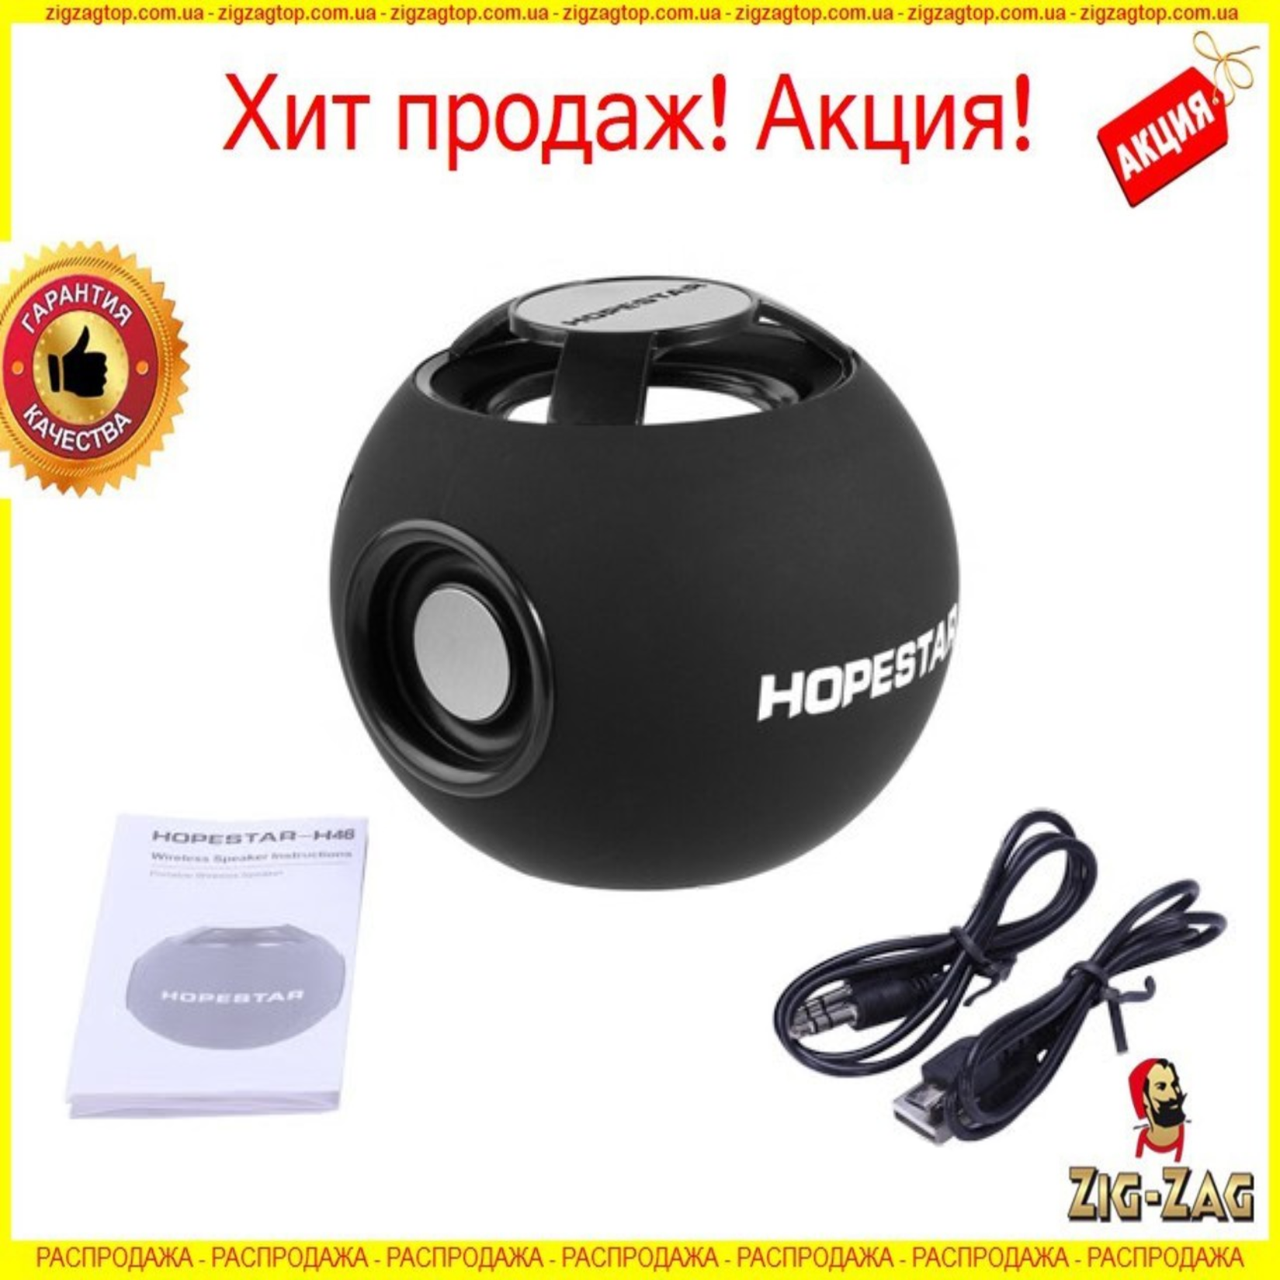 Bluetooth колонка HOPESTAR-H46 StrongPower c Speakerphone Радіо Чорна Кругла з Мікрофоном Блютуз Маленька